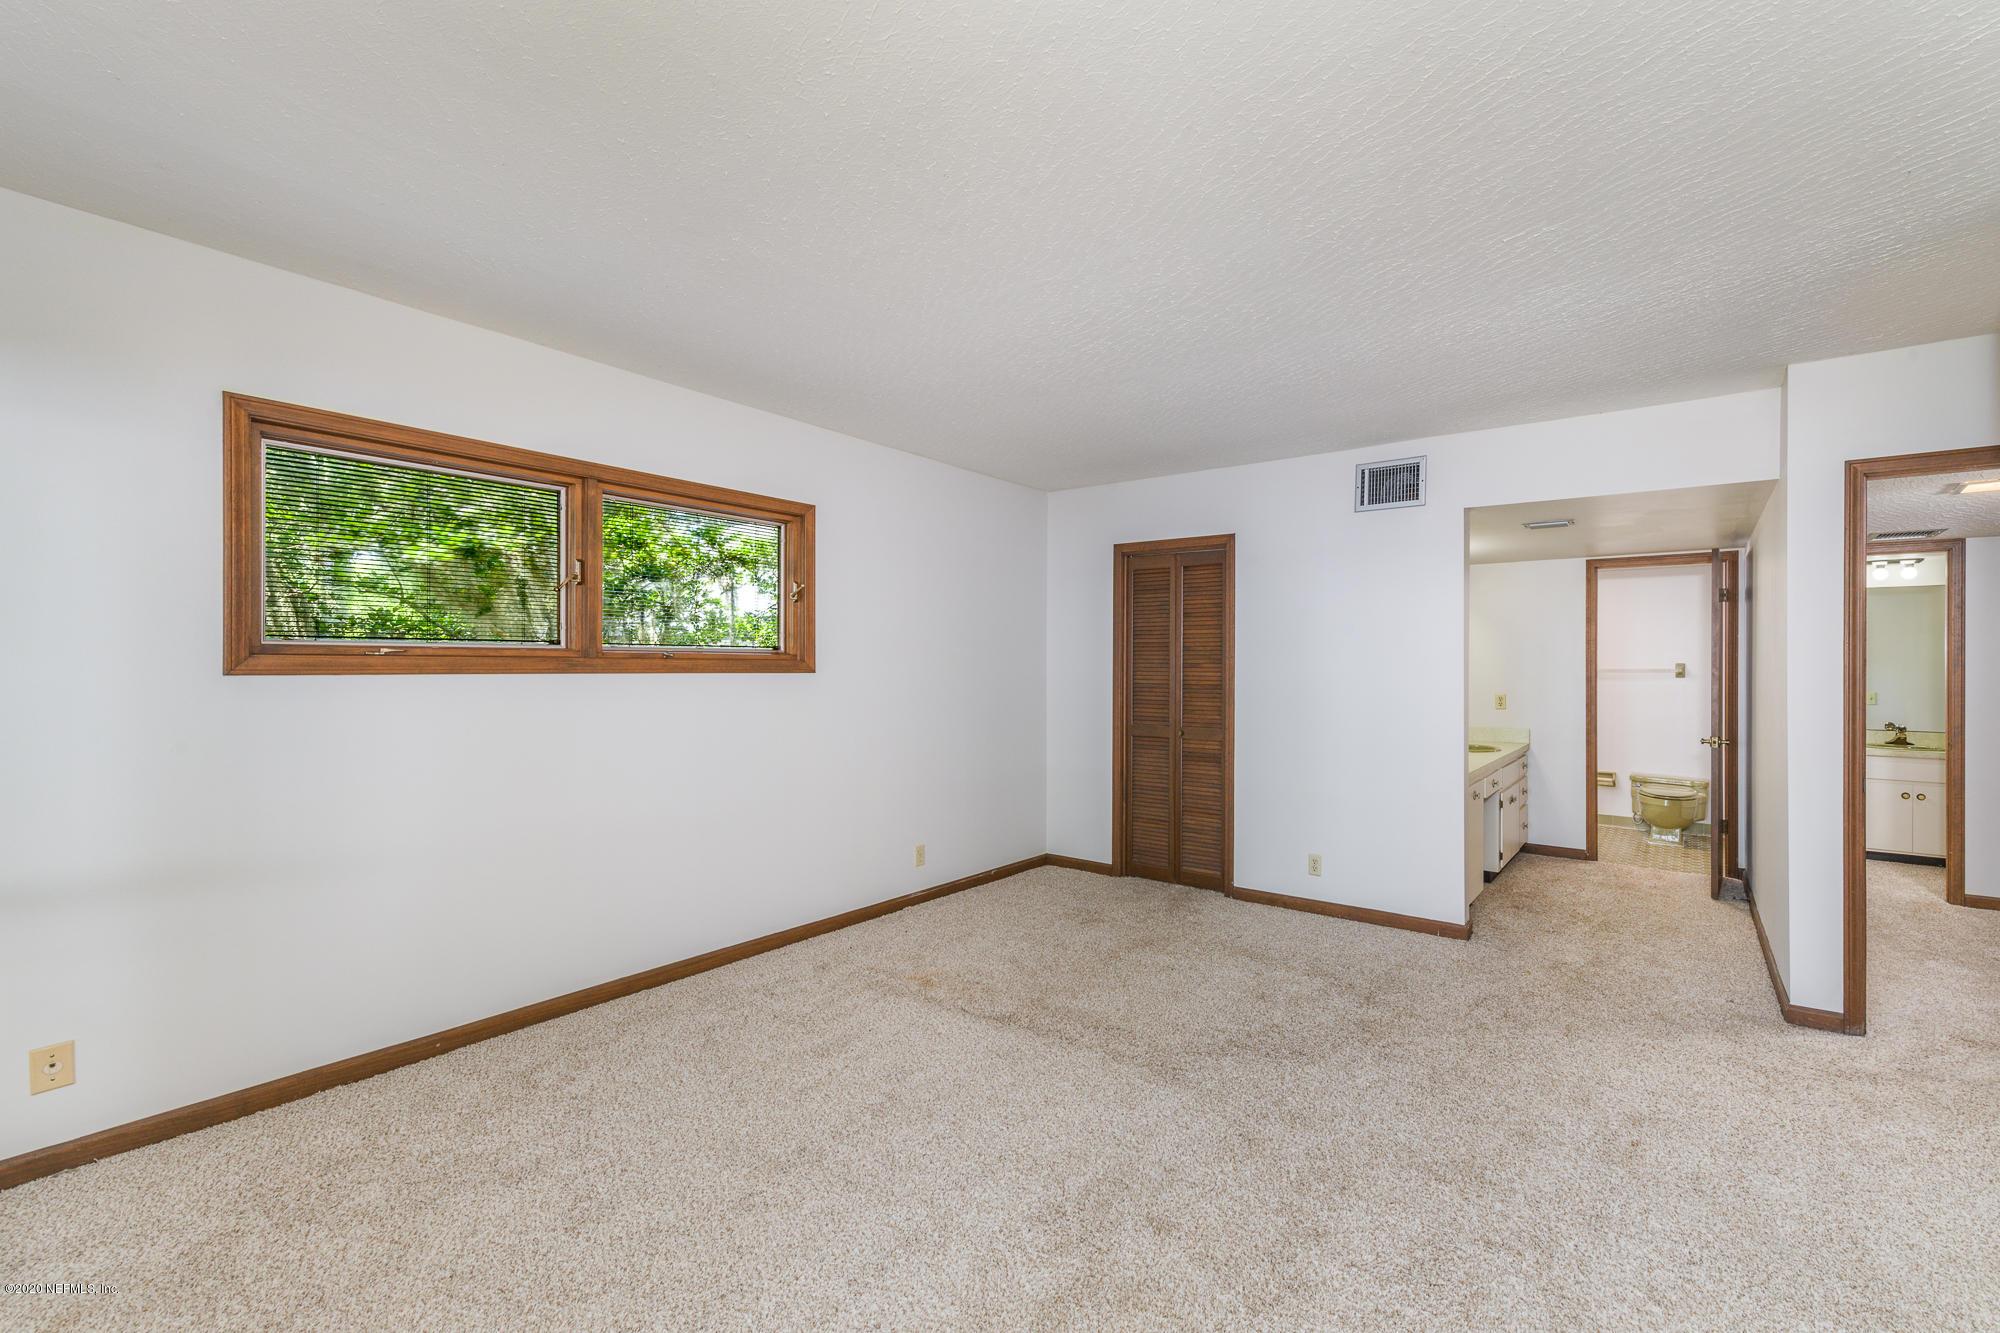 3233 US-17, ORANGE PARK, FLORIDA 32003, 4 Bedrooms Bedrooms, ,3 BathroomsBathrooms,Residential,For sale,US-17,1047642